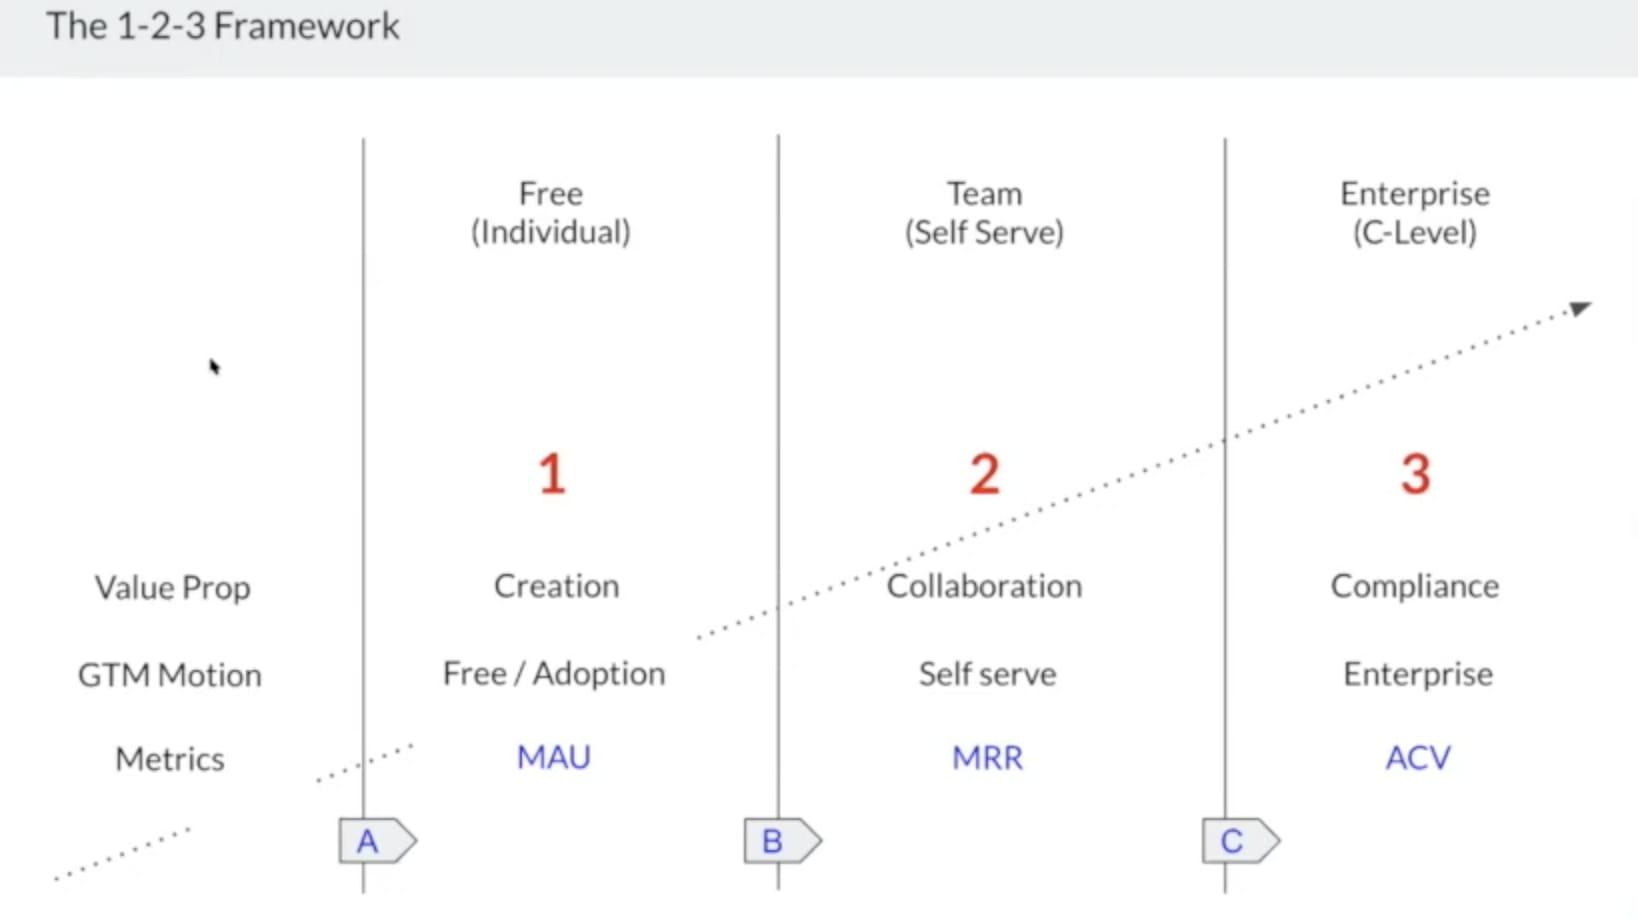 1-2-3 Framework